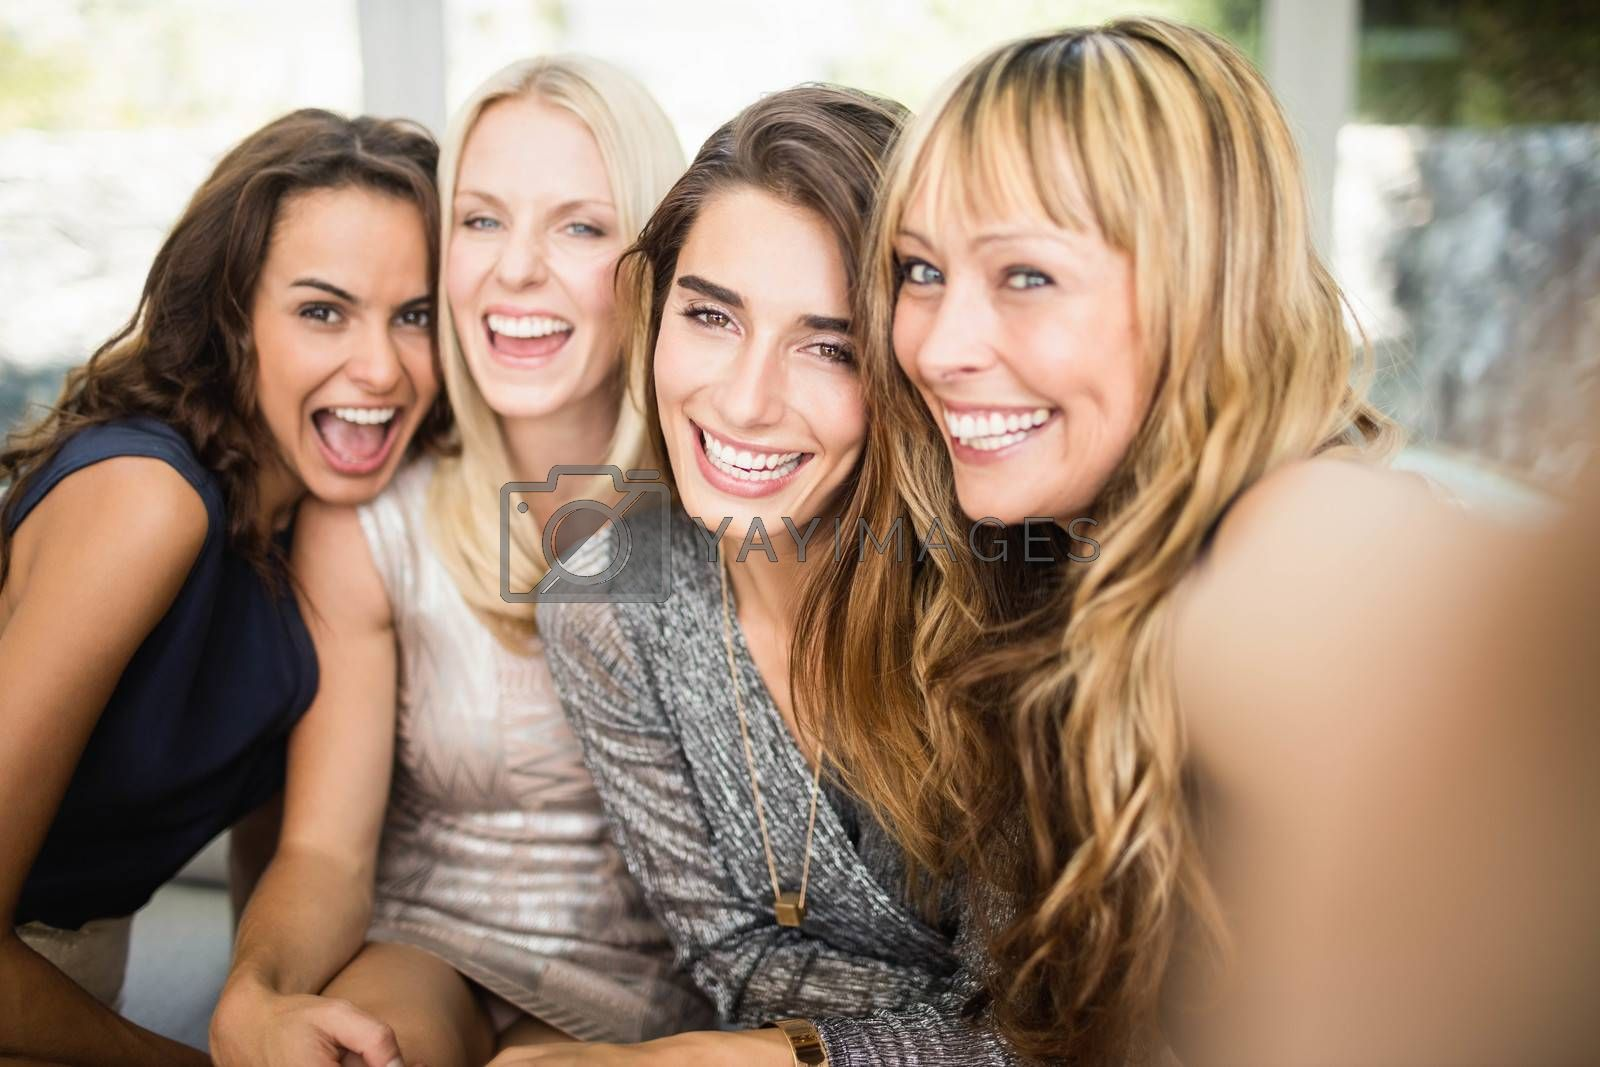 Portrait of beautiful women having fun at party